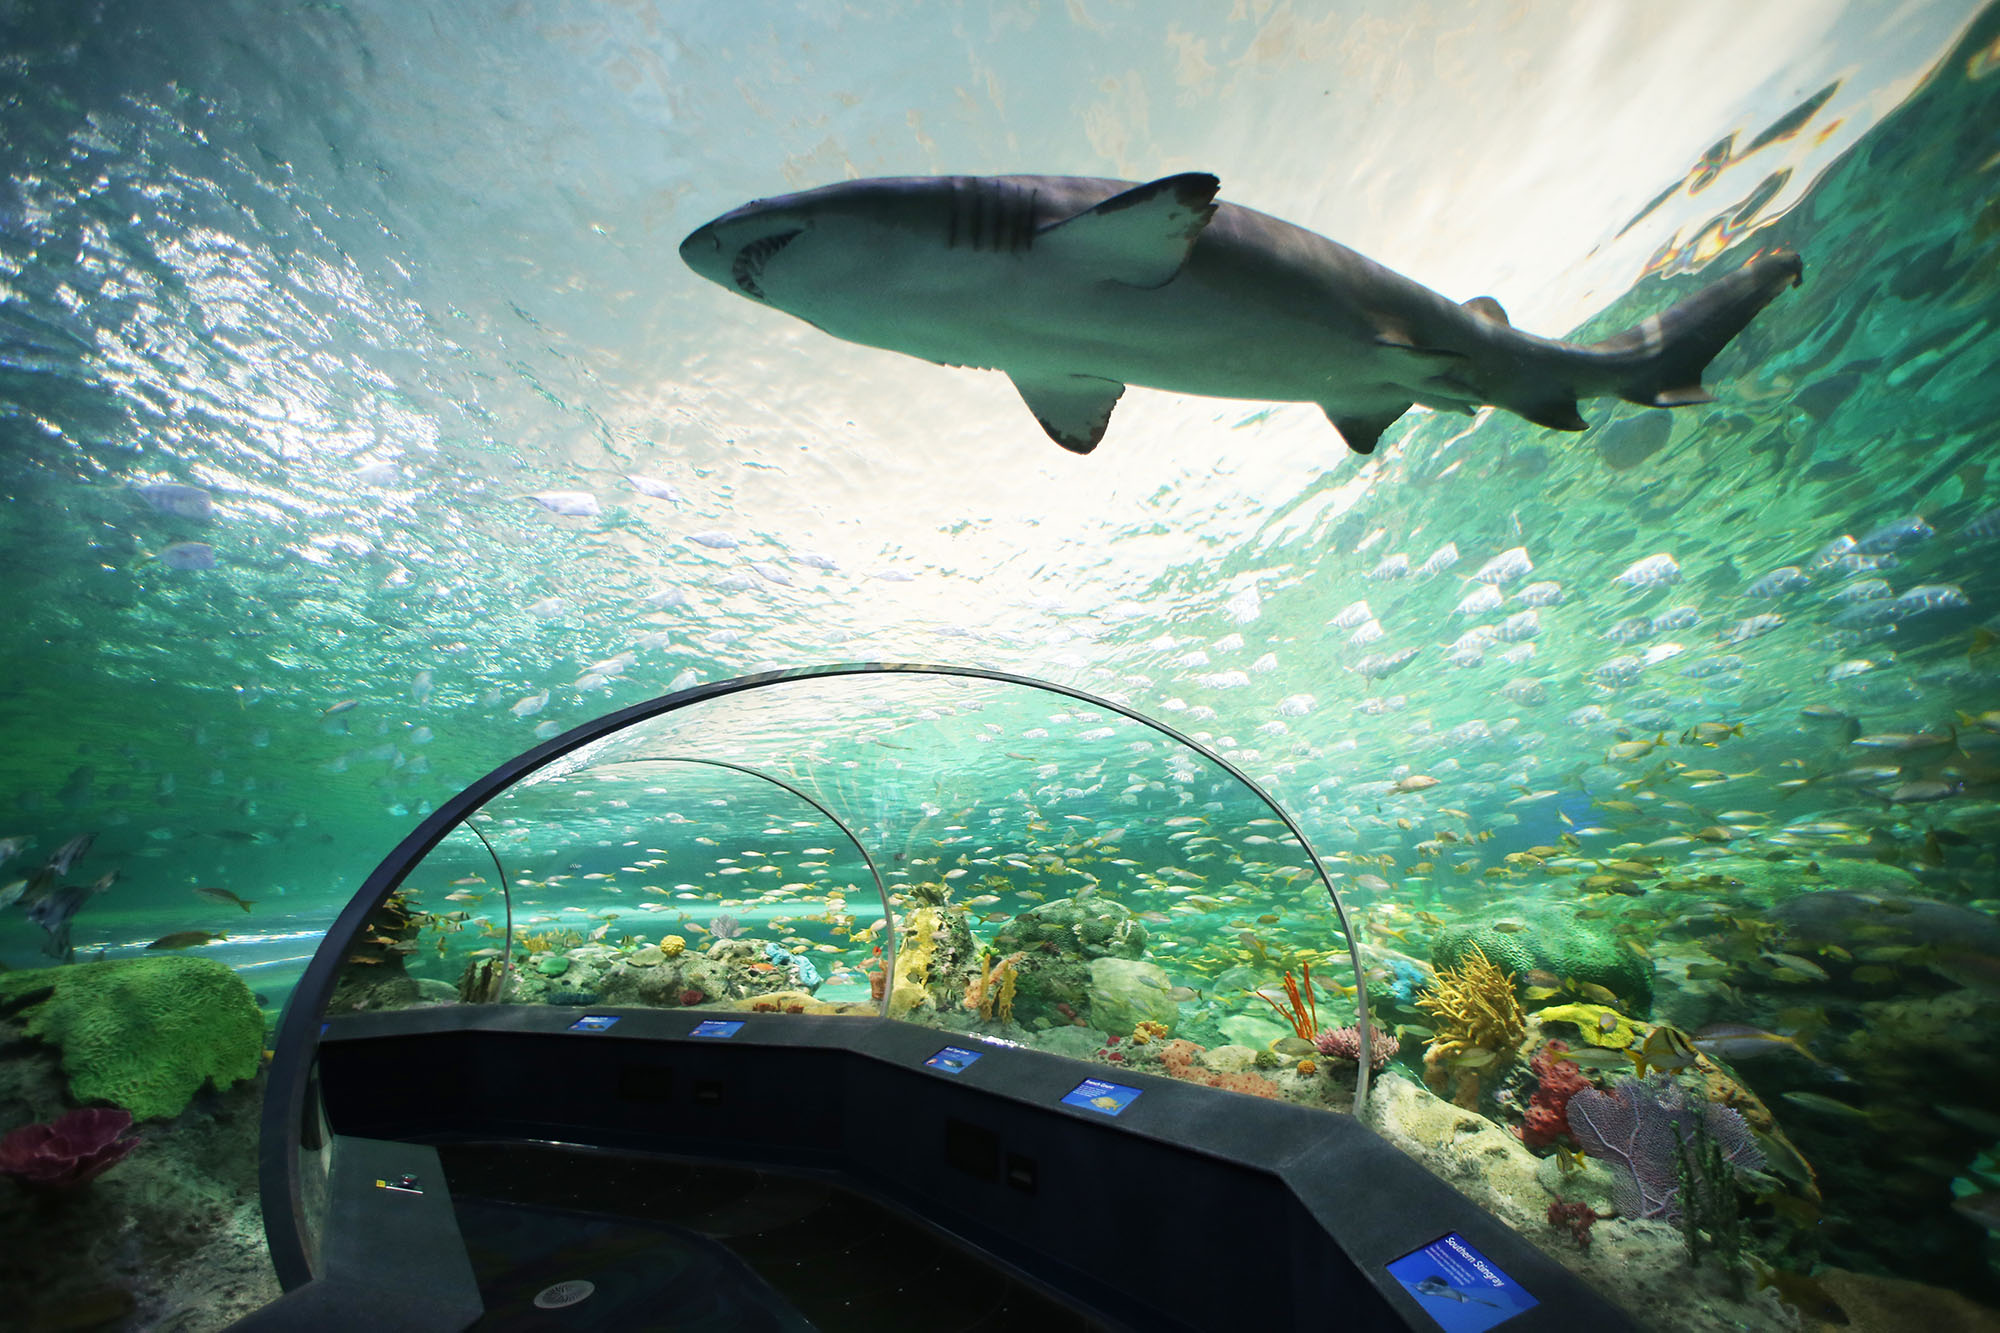 Aquaristik-Infos-247.de - Aquaristik Infos & Aquaristik Tipps | Foto: Foto: Das Ripleys Aquarium of Canada, Dangerous Lagoon